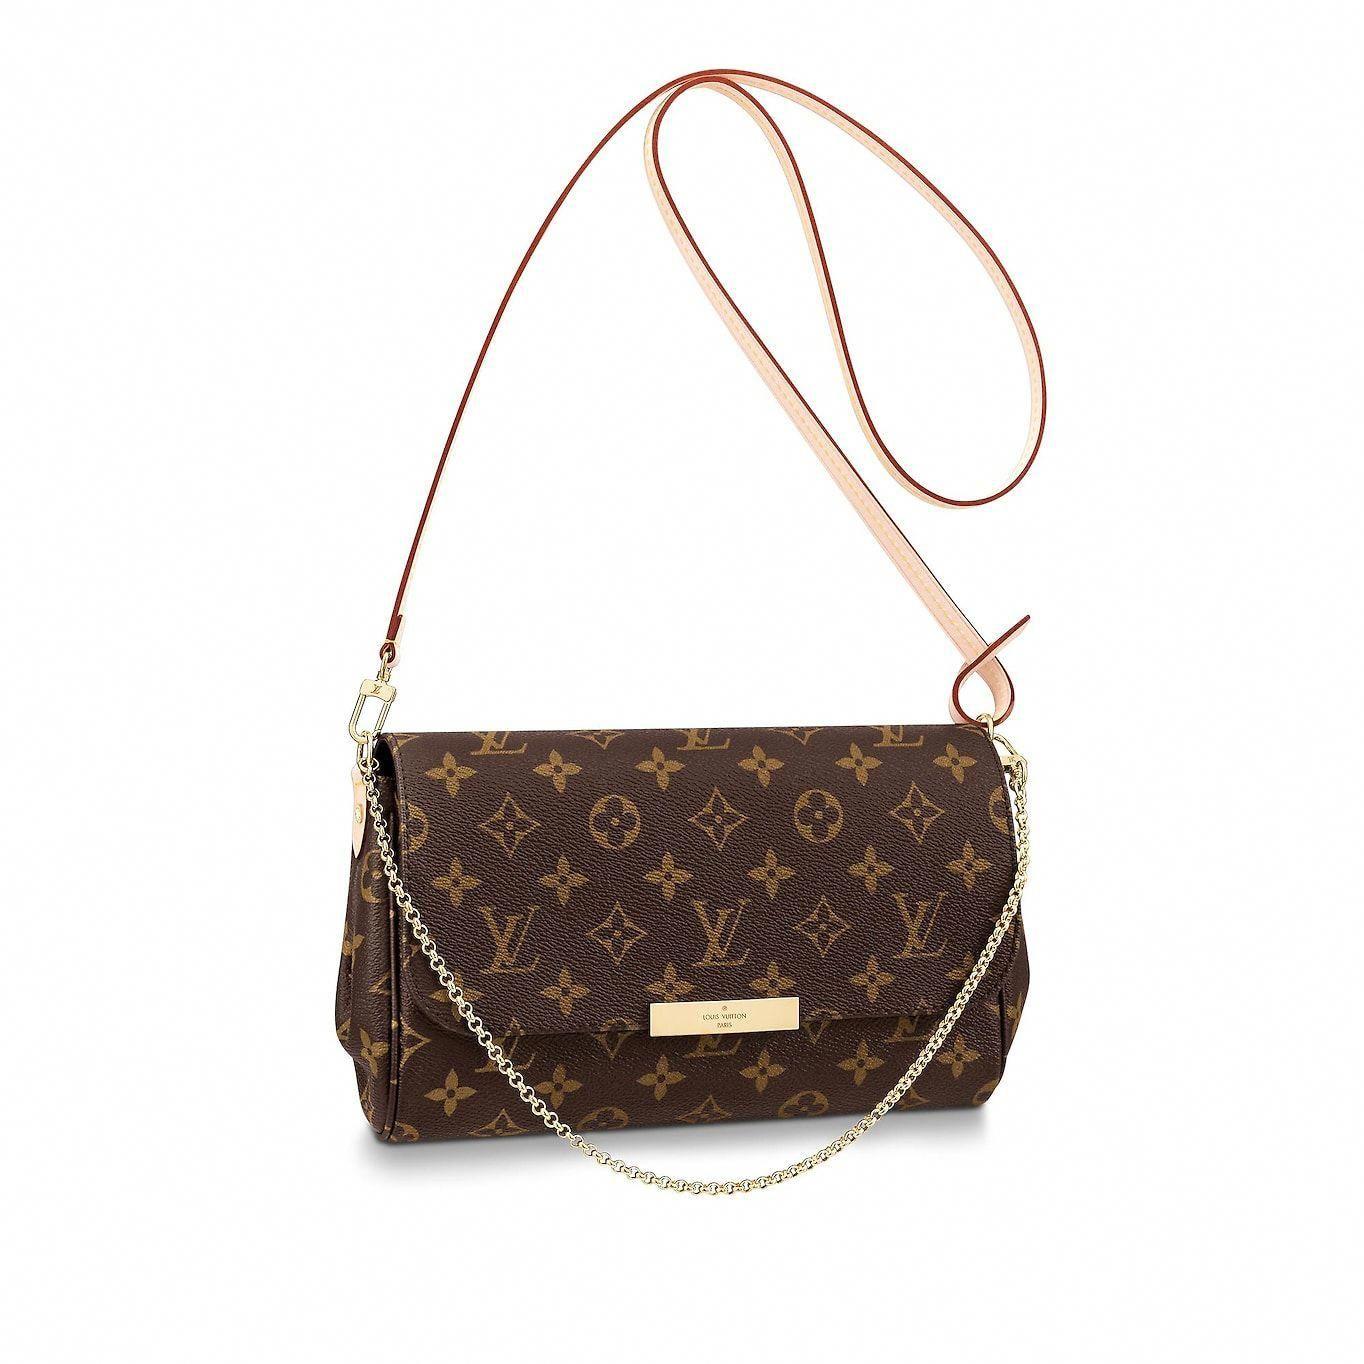 ac48e16bf10 View 1 - Monogram HANDBAGS Cross Body Bags Favorite MM   Louis Vuitton ®   Louisvuittonhandbags